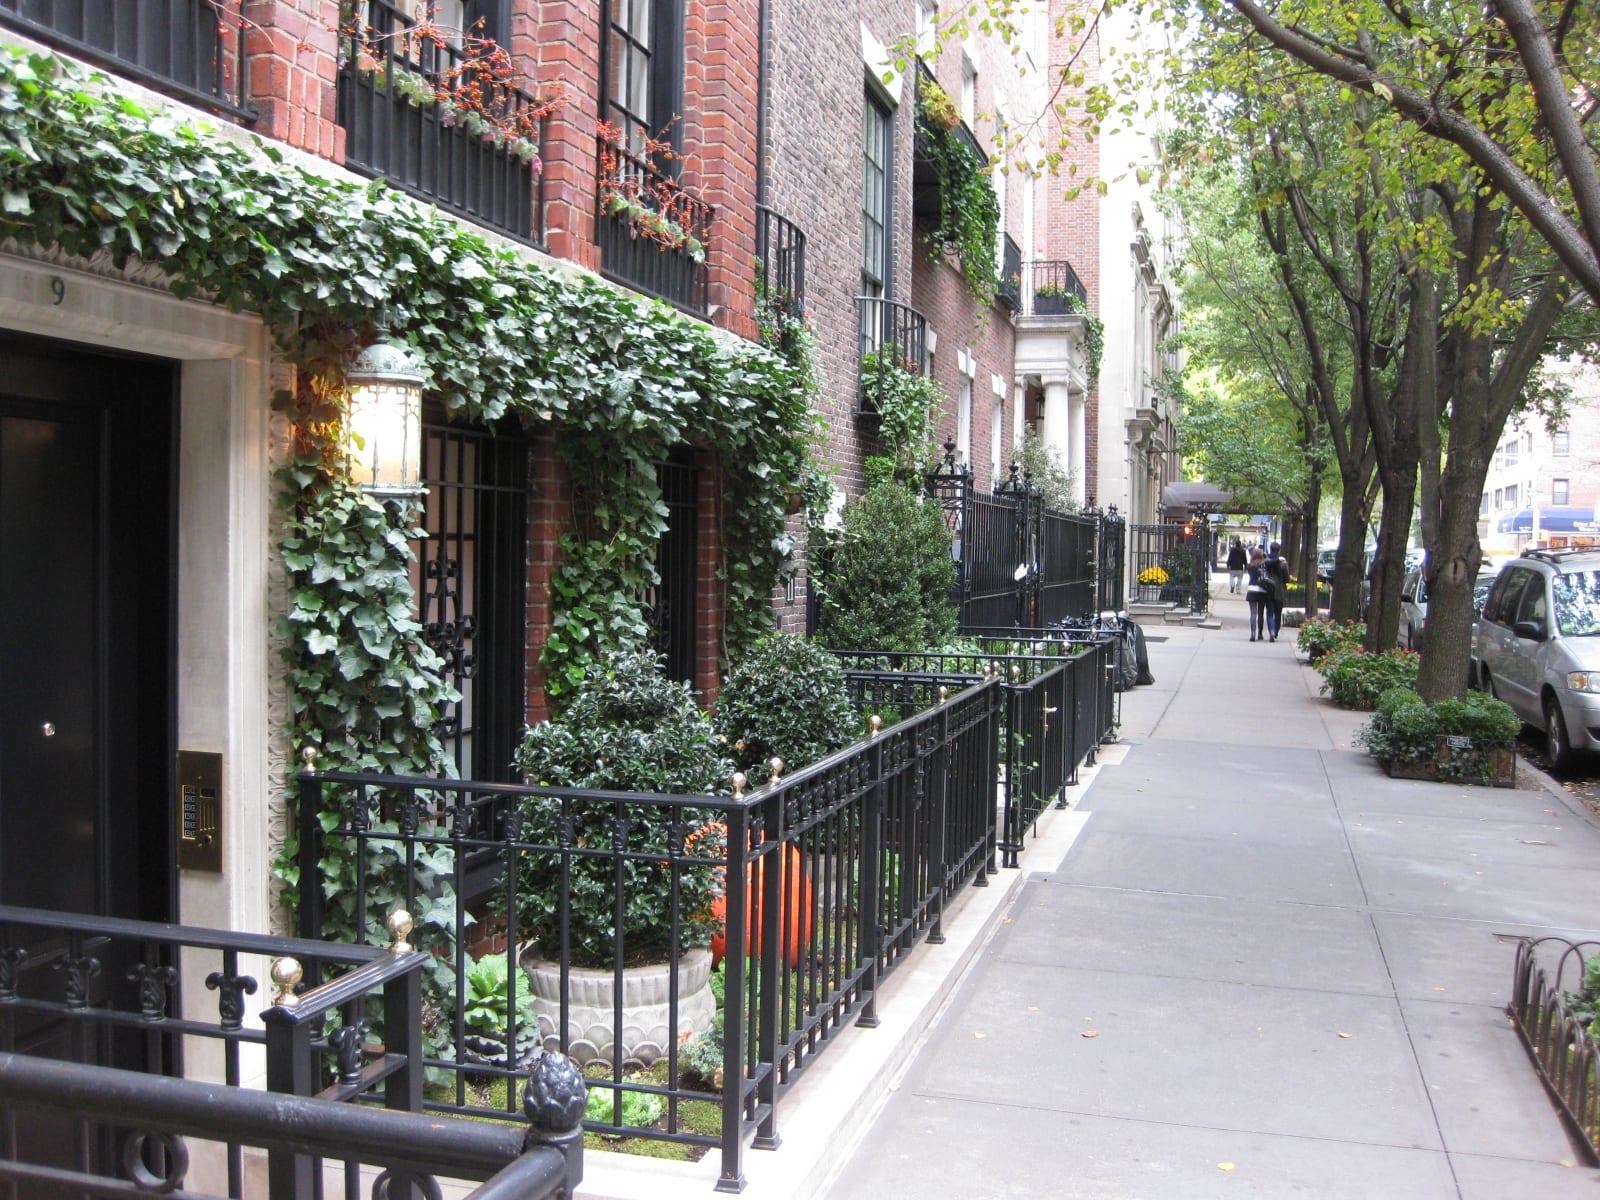 Kids in the City: Top Three Family Friendly New York Neighborhoods